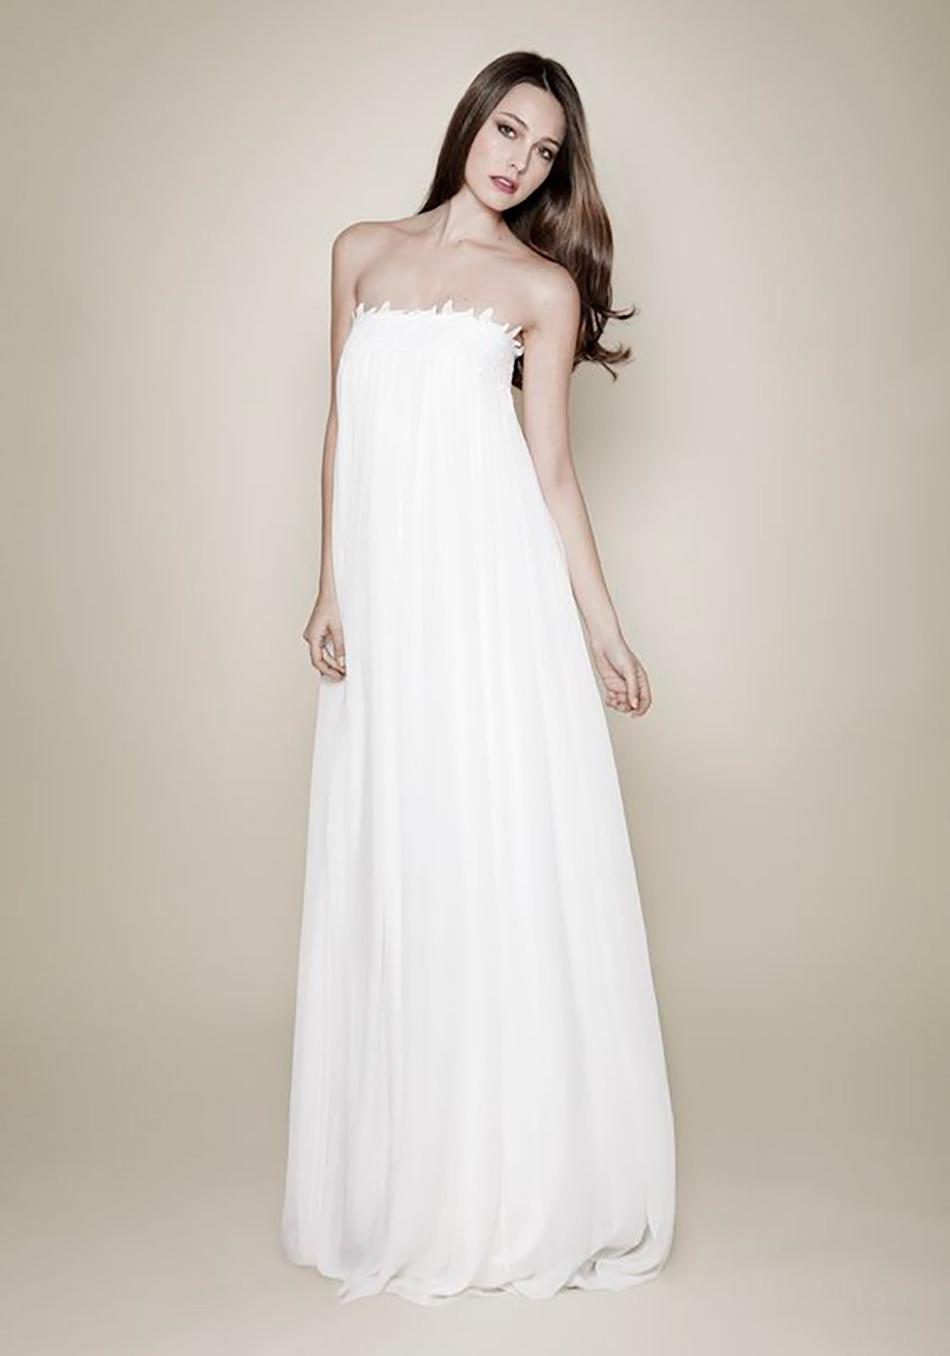 The best bohemian wedding dresses - Costarellos | CHWV